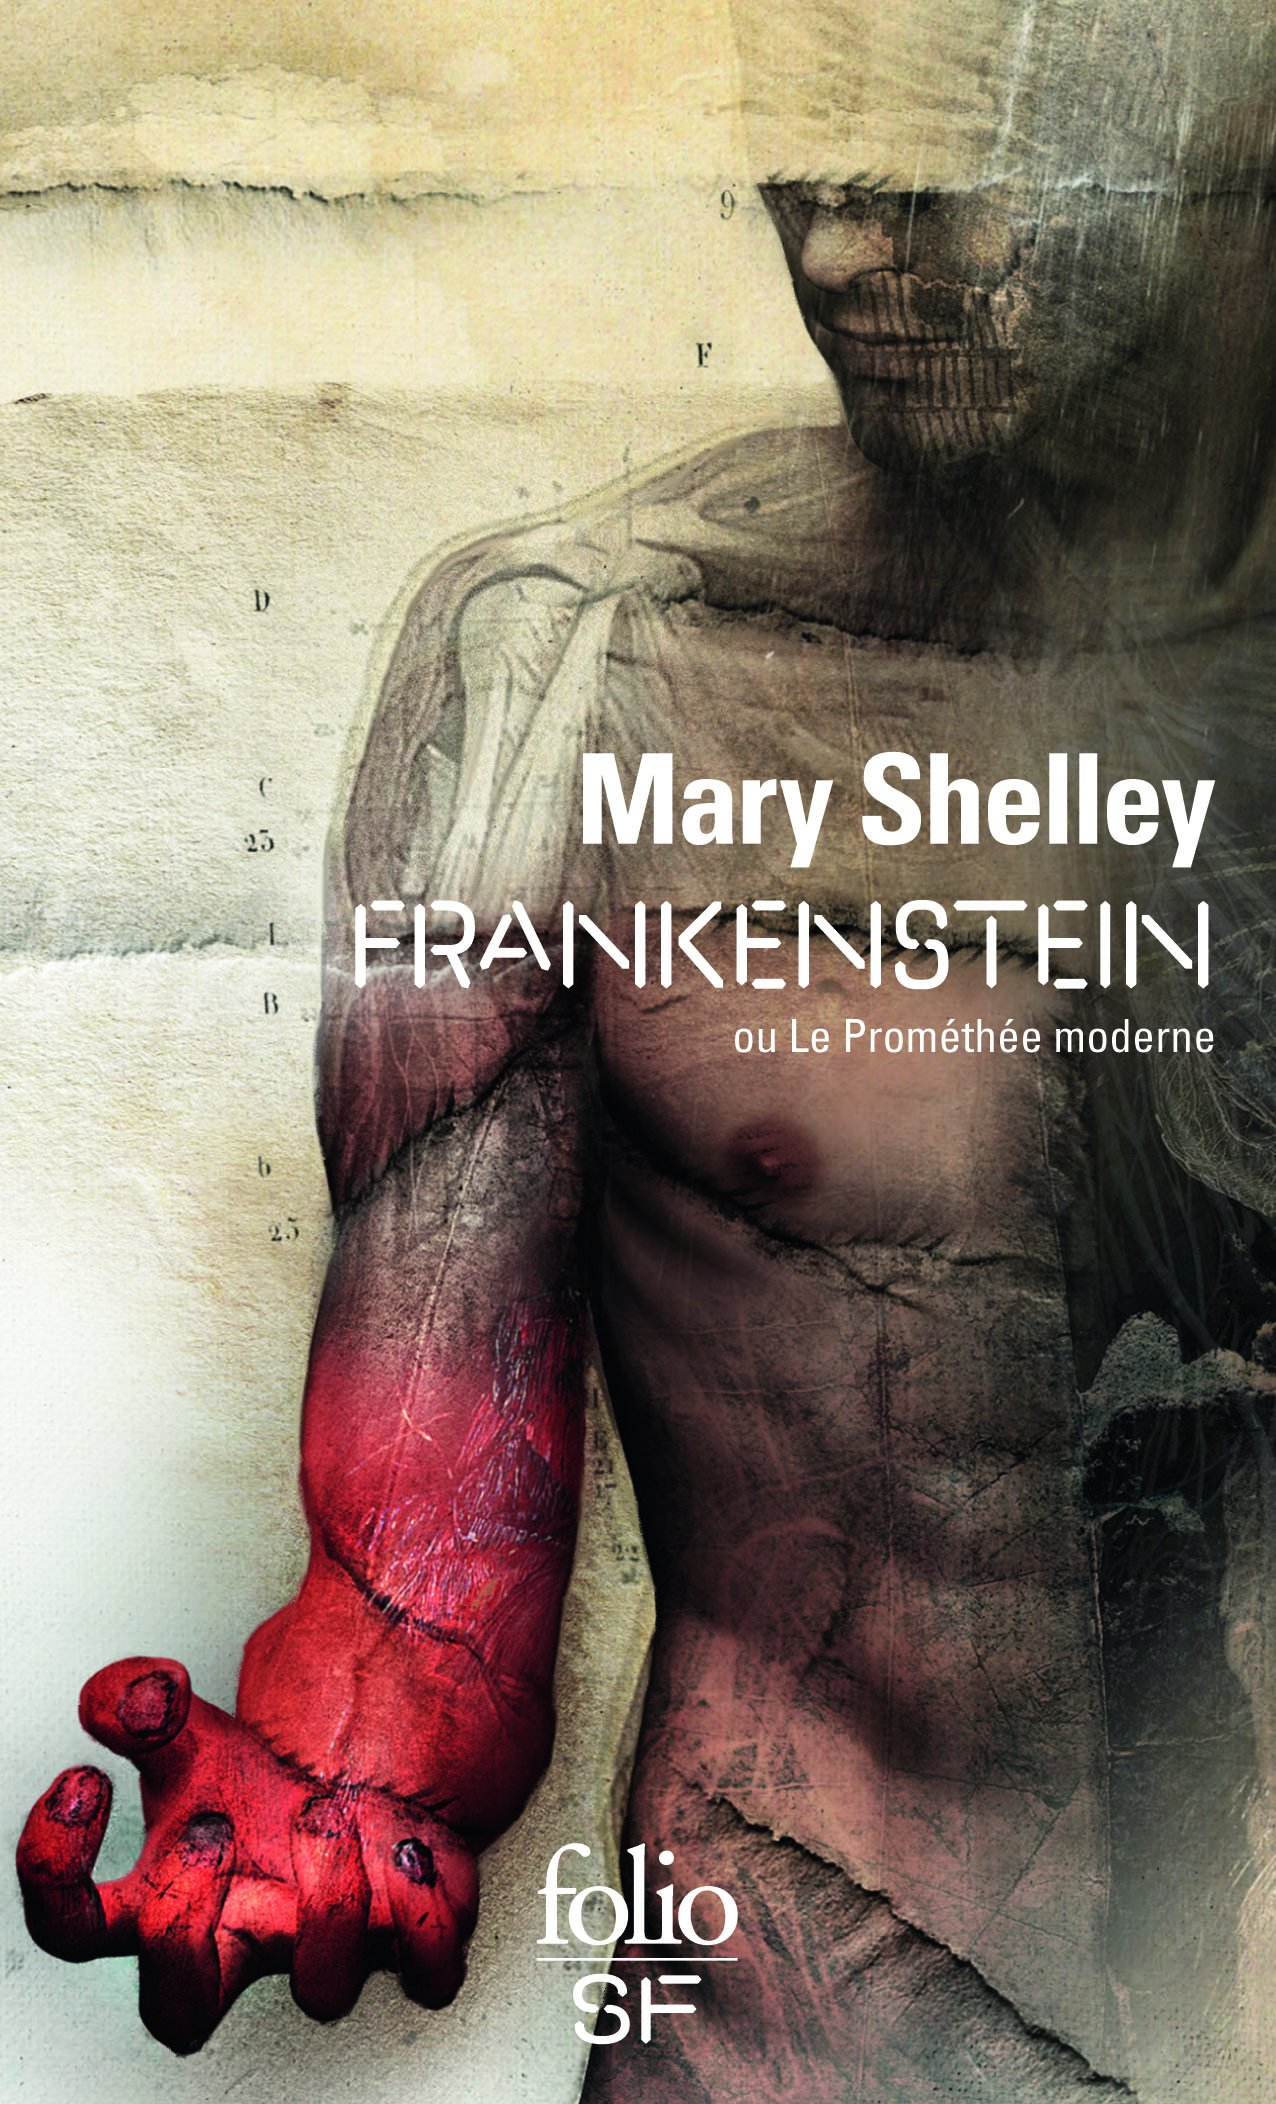 Frankenstein ou Le Prométhée moderne Broché – 5 novembre 2015 Mary Shelley Alain Morvan Folio 2070468089